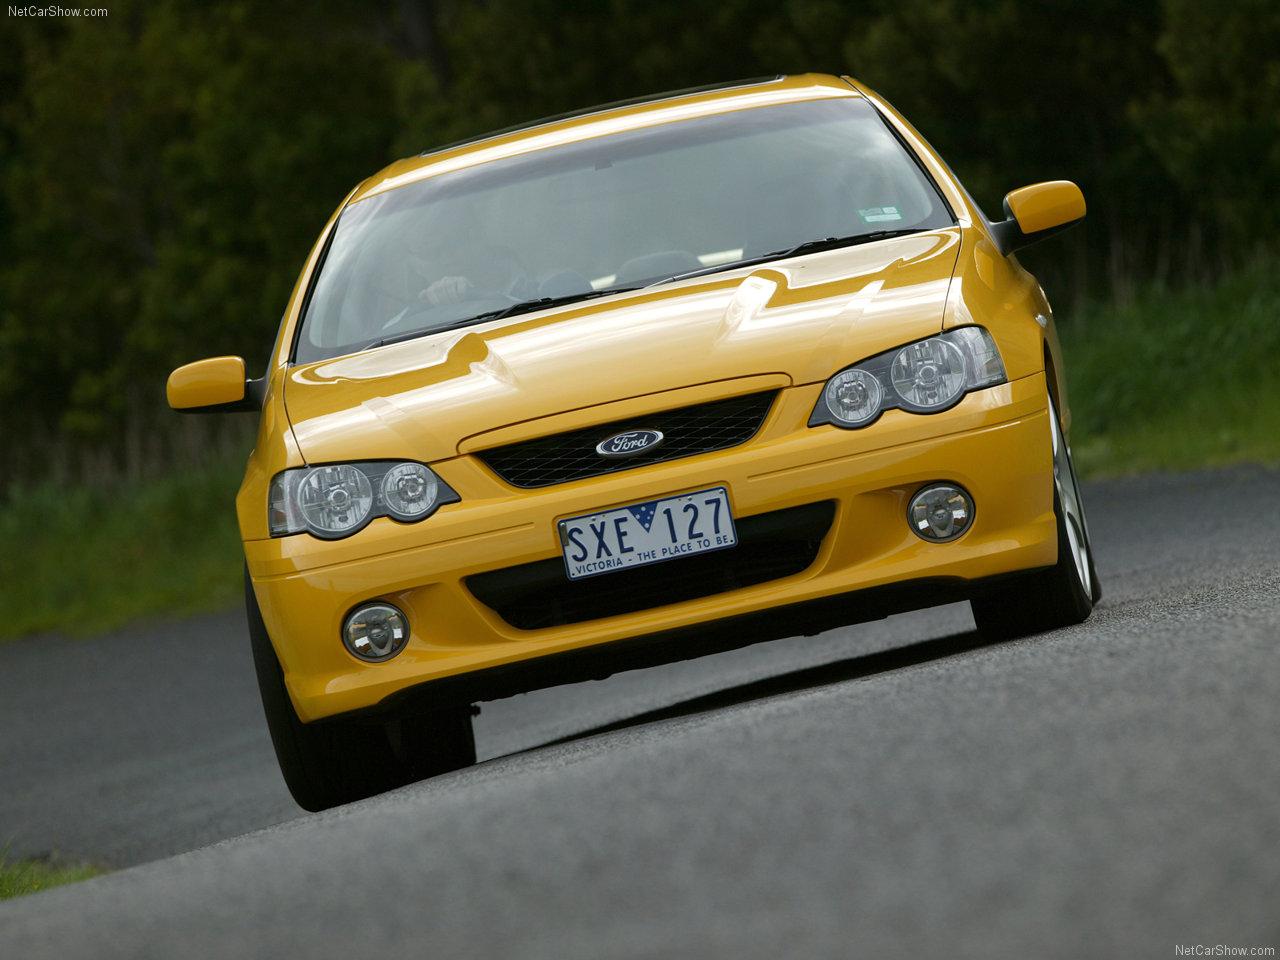 http://3.bp.blogspot.com/-4bGX5hTehYo/TZ8RrX0EAKI/AAAAAAAAHQw/BKNt3ne1vdQ/s1600/Ford-BA_MkII_Falcon_XR8_2004_1280x960_wallpaper_03.jpg